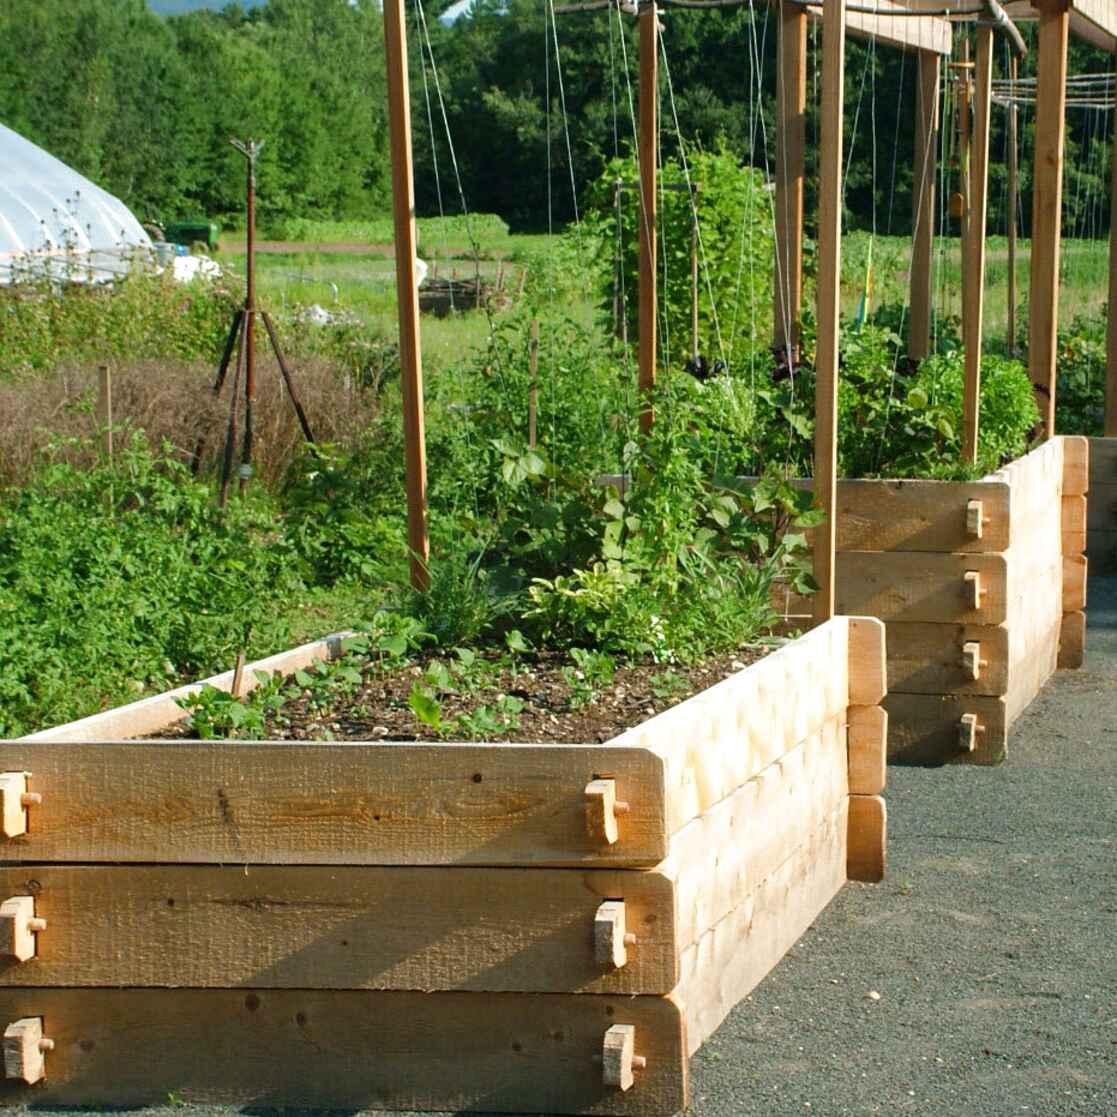 Vidaxl Raised Garden Bed With Greenhouse Weather Resistant Outdoor Lawn Backyard Patio Flower Planter Pot Box